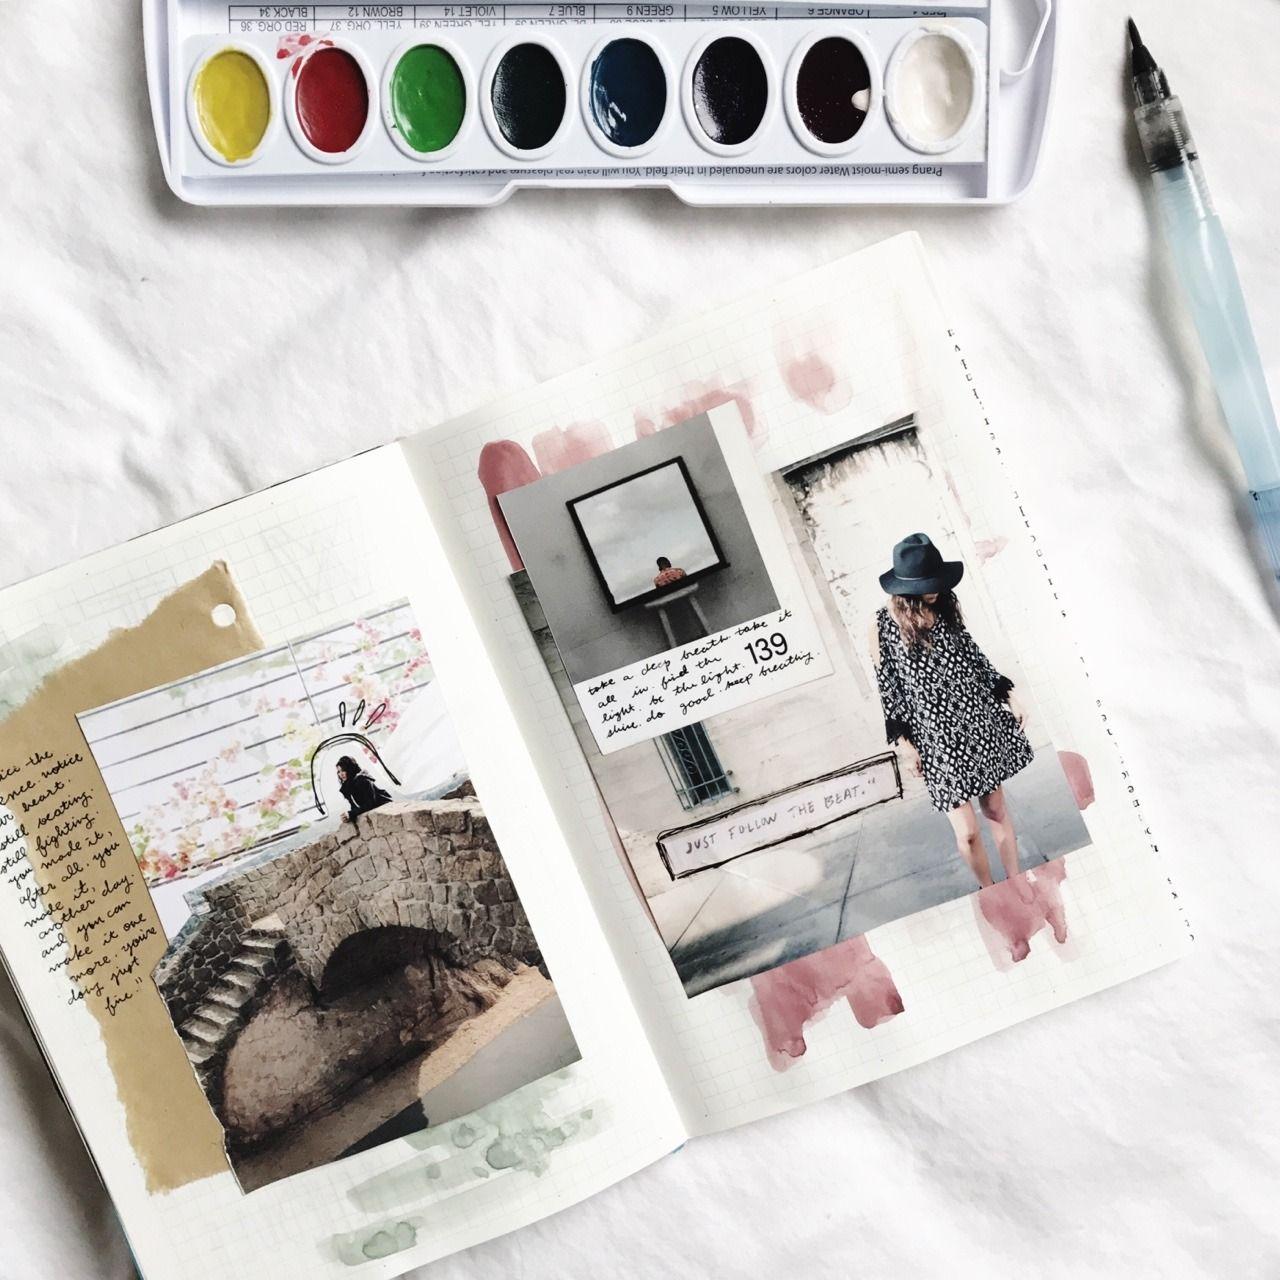 journalsanctuary tumblr art journal glue book art therapy activities